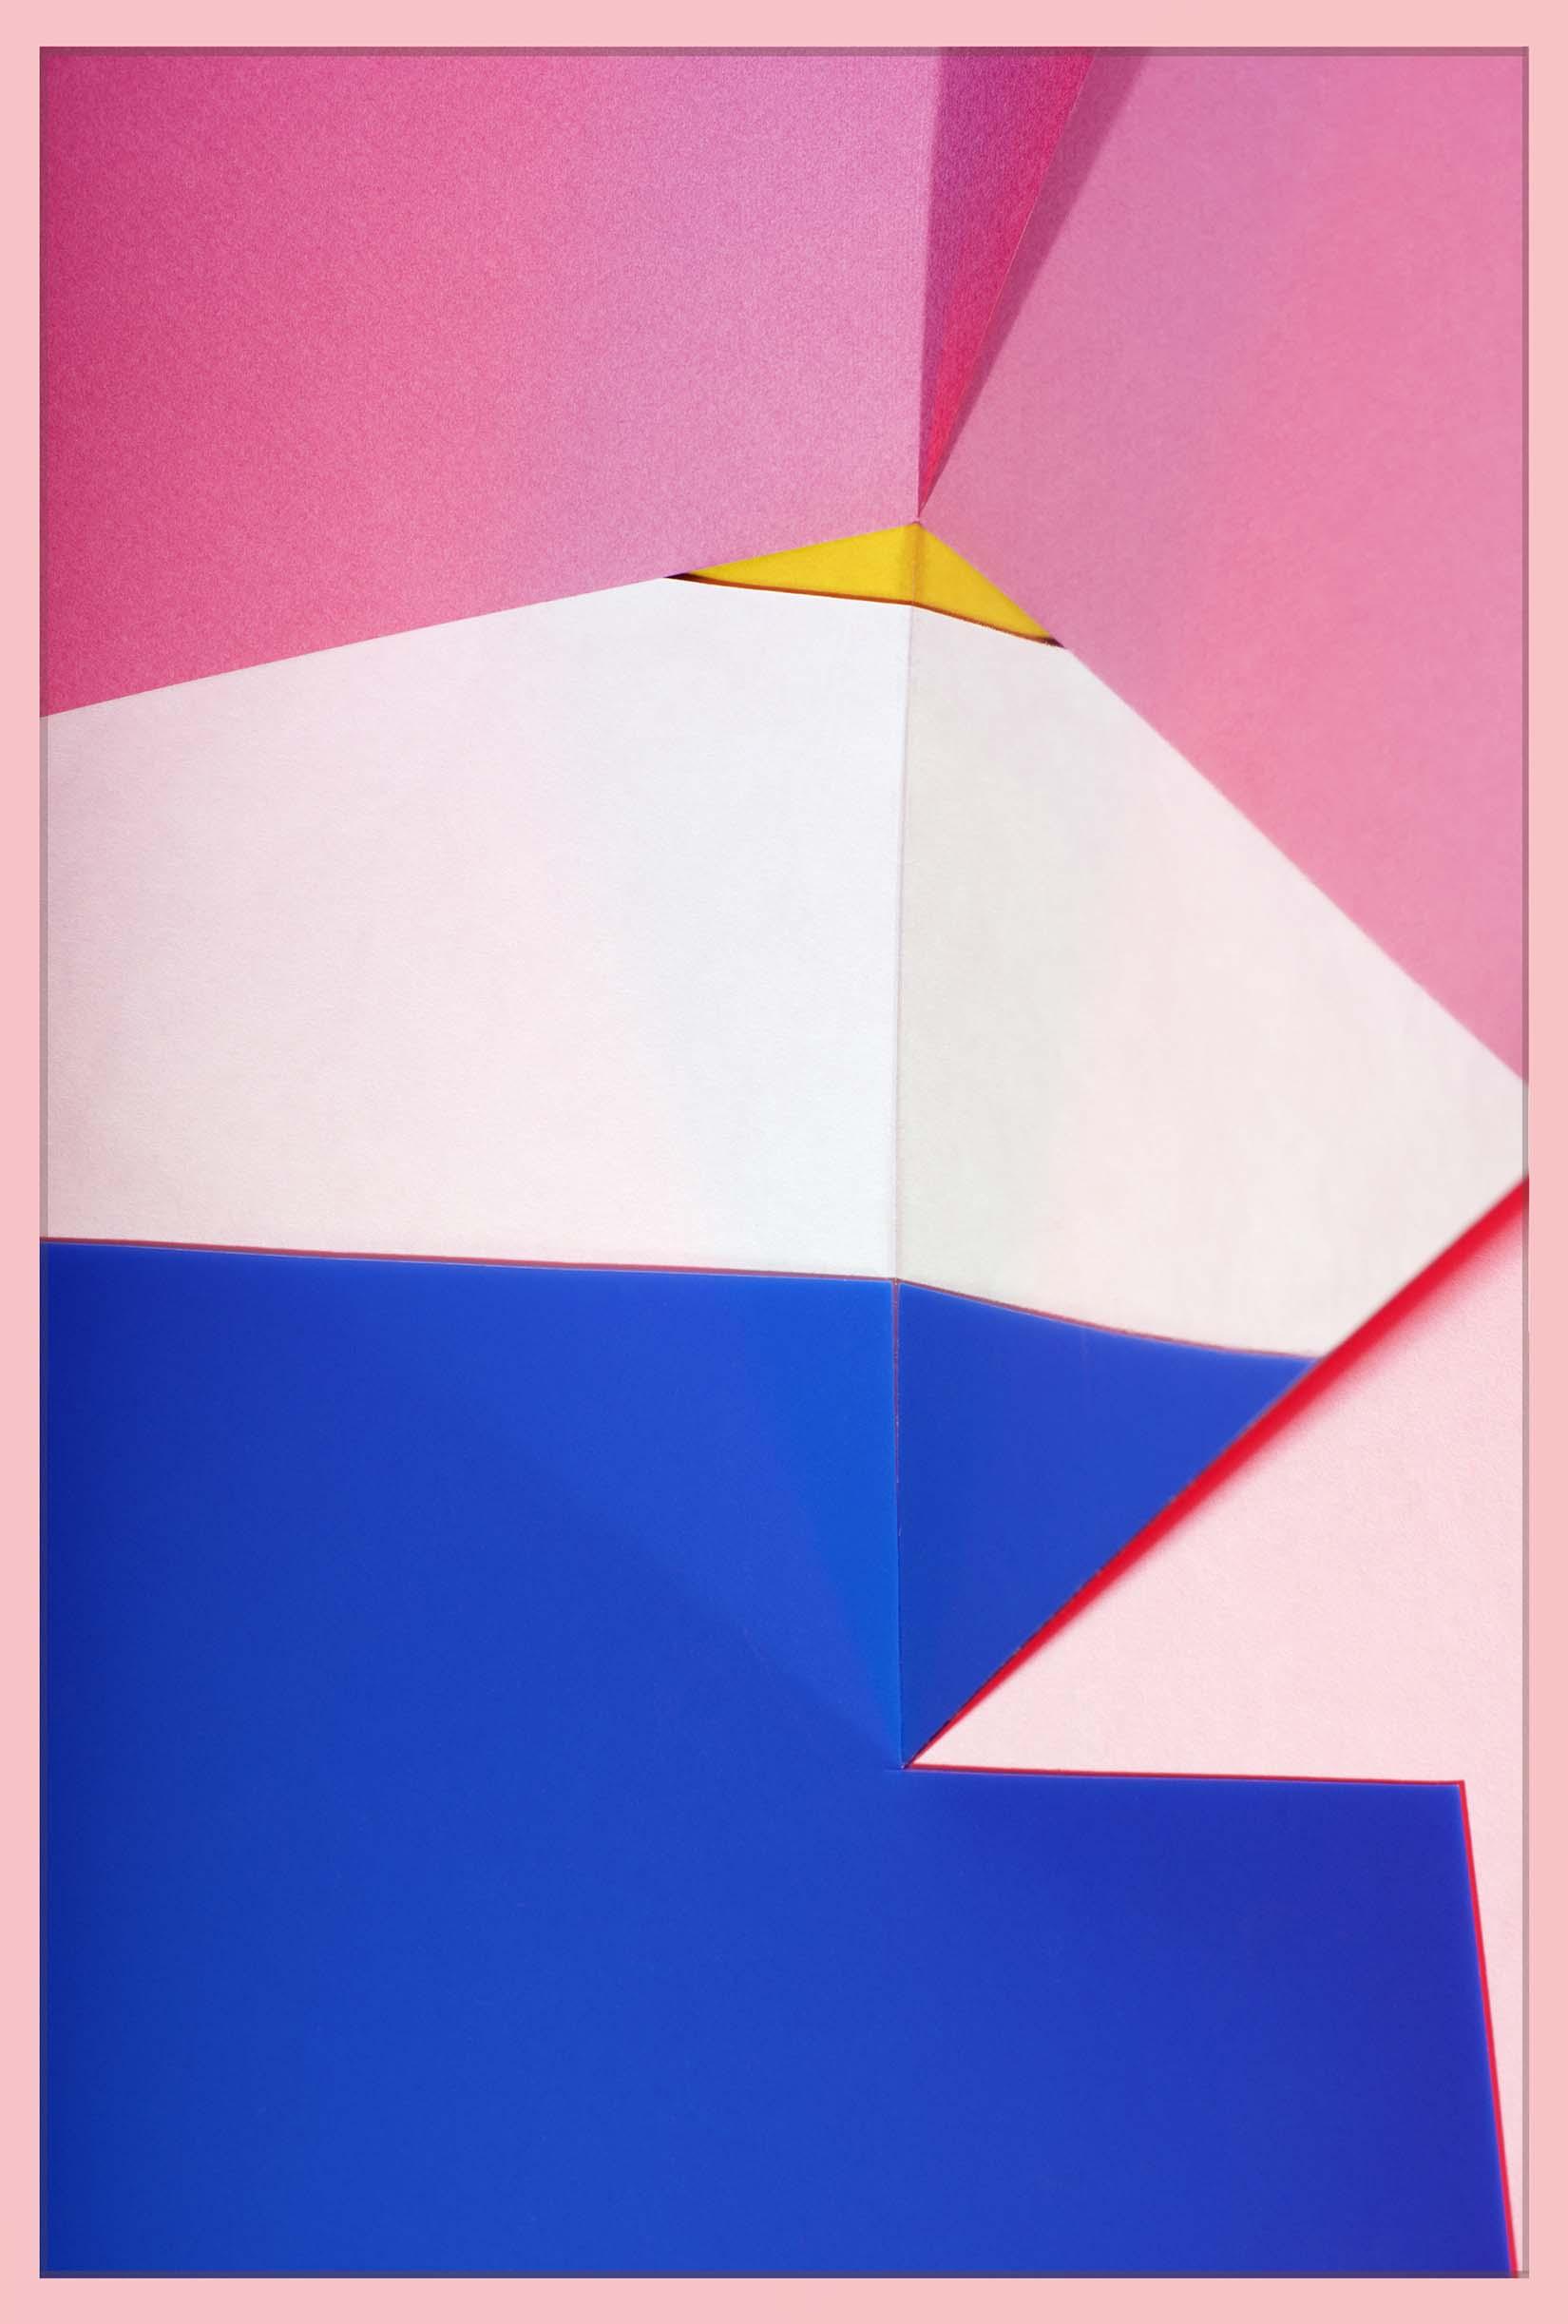 LYDIA WEGNER   Pink Fold  2017 Archival inkjet print 90 x 60 cm